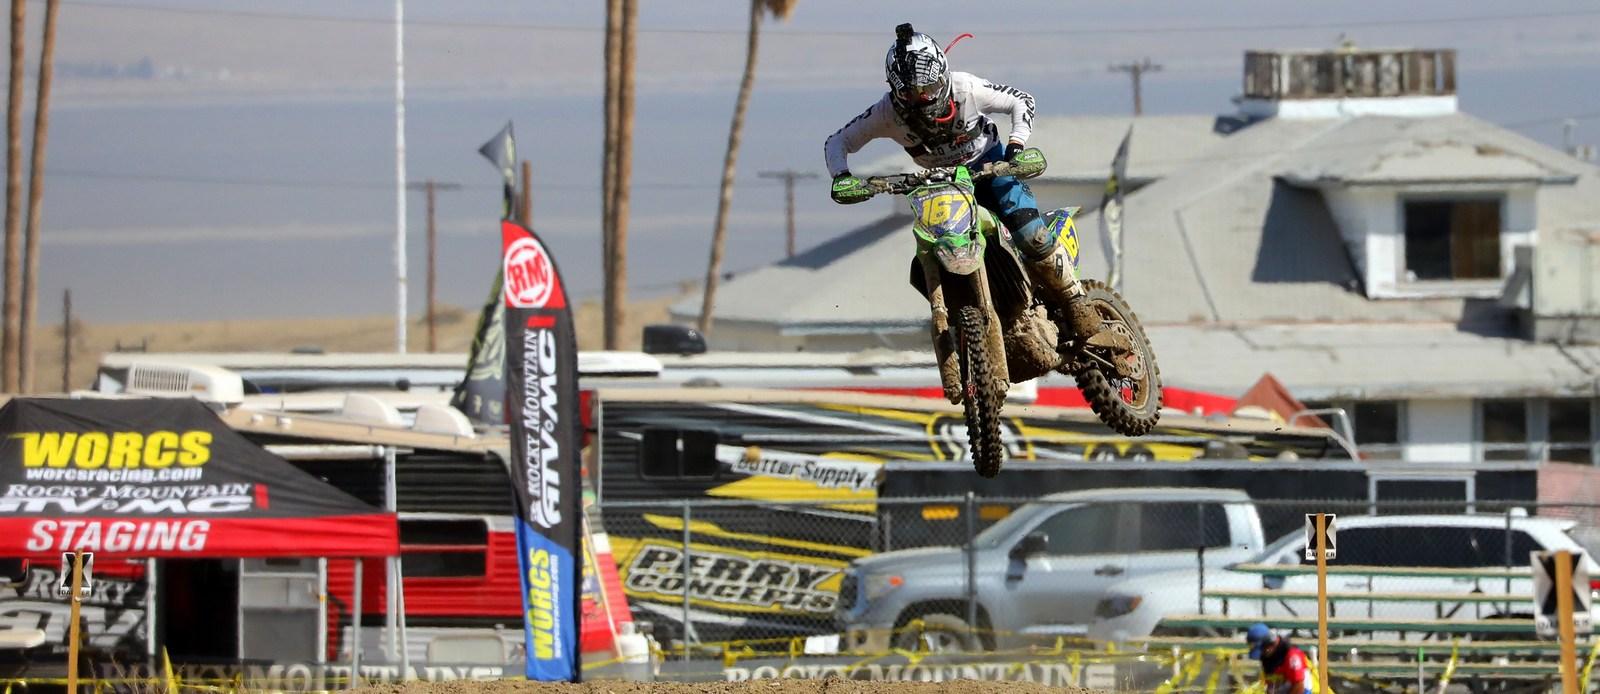 2019-10-zach-bell-jump-bike-worcs-racing